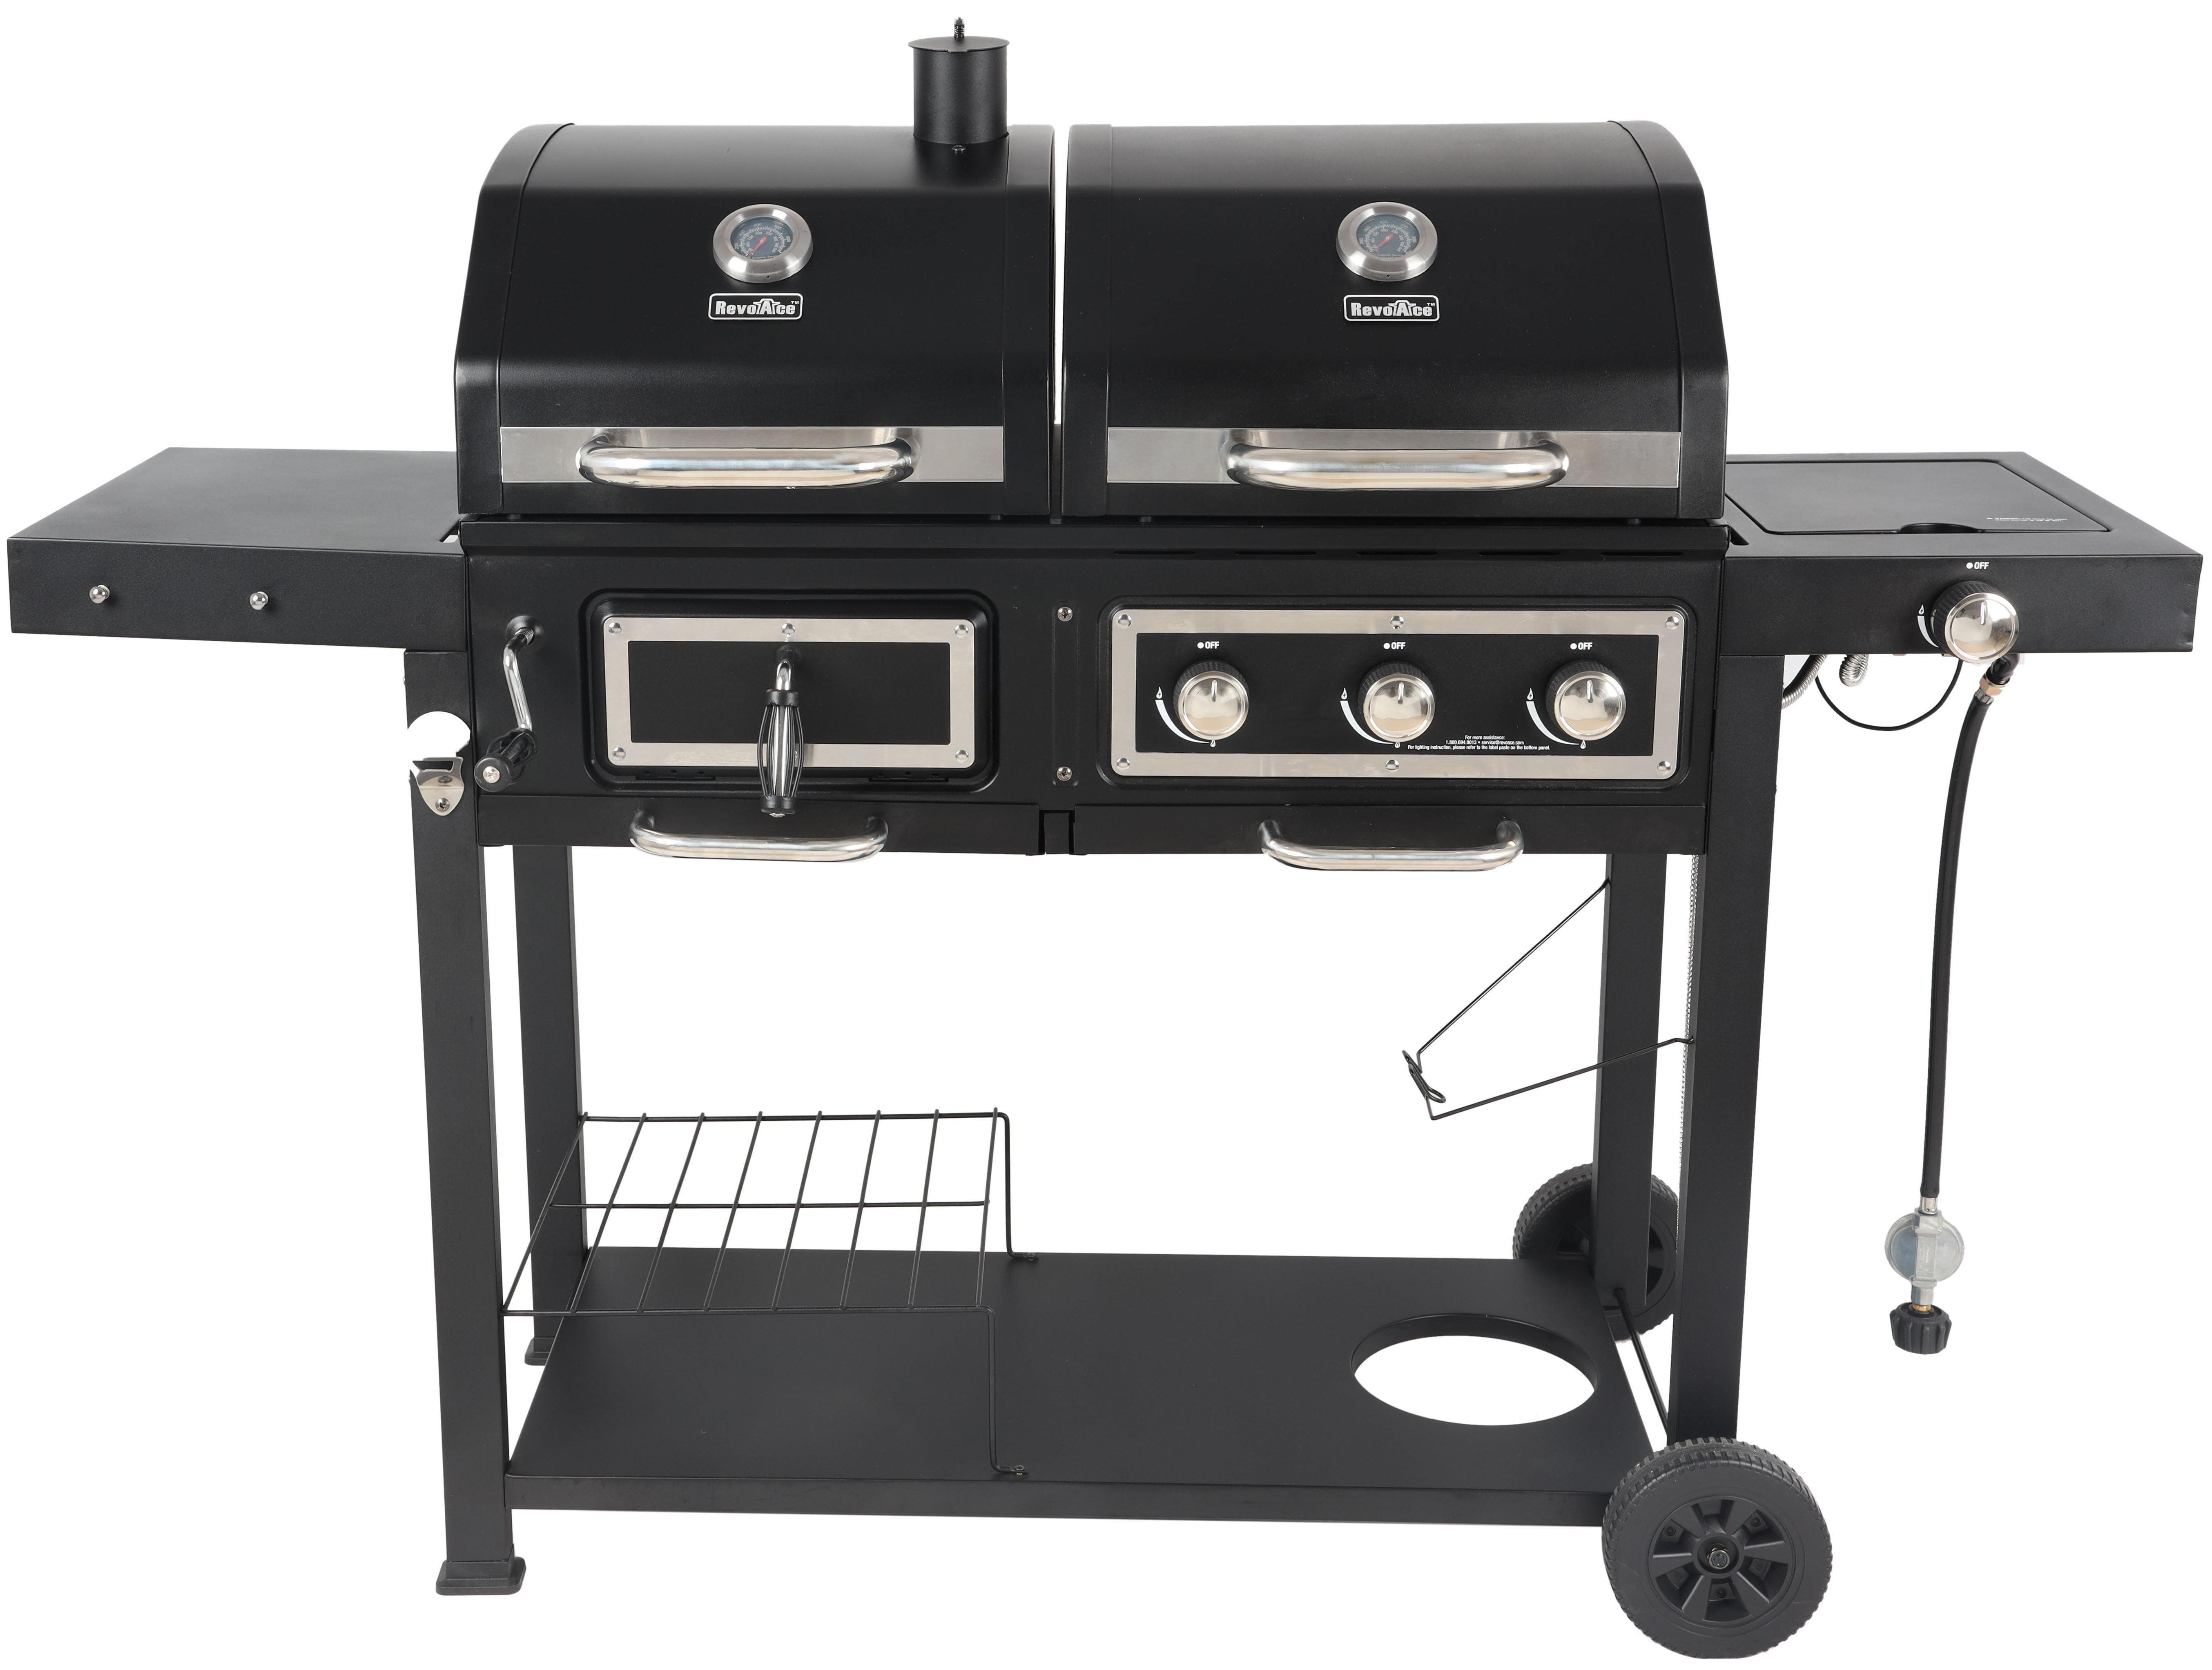 Revoace Dual Fuel Gas Charcoal Combo Grill